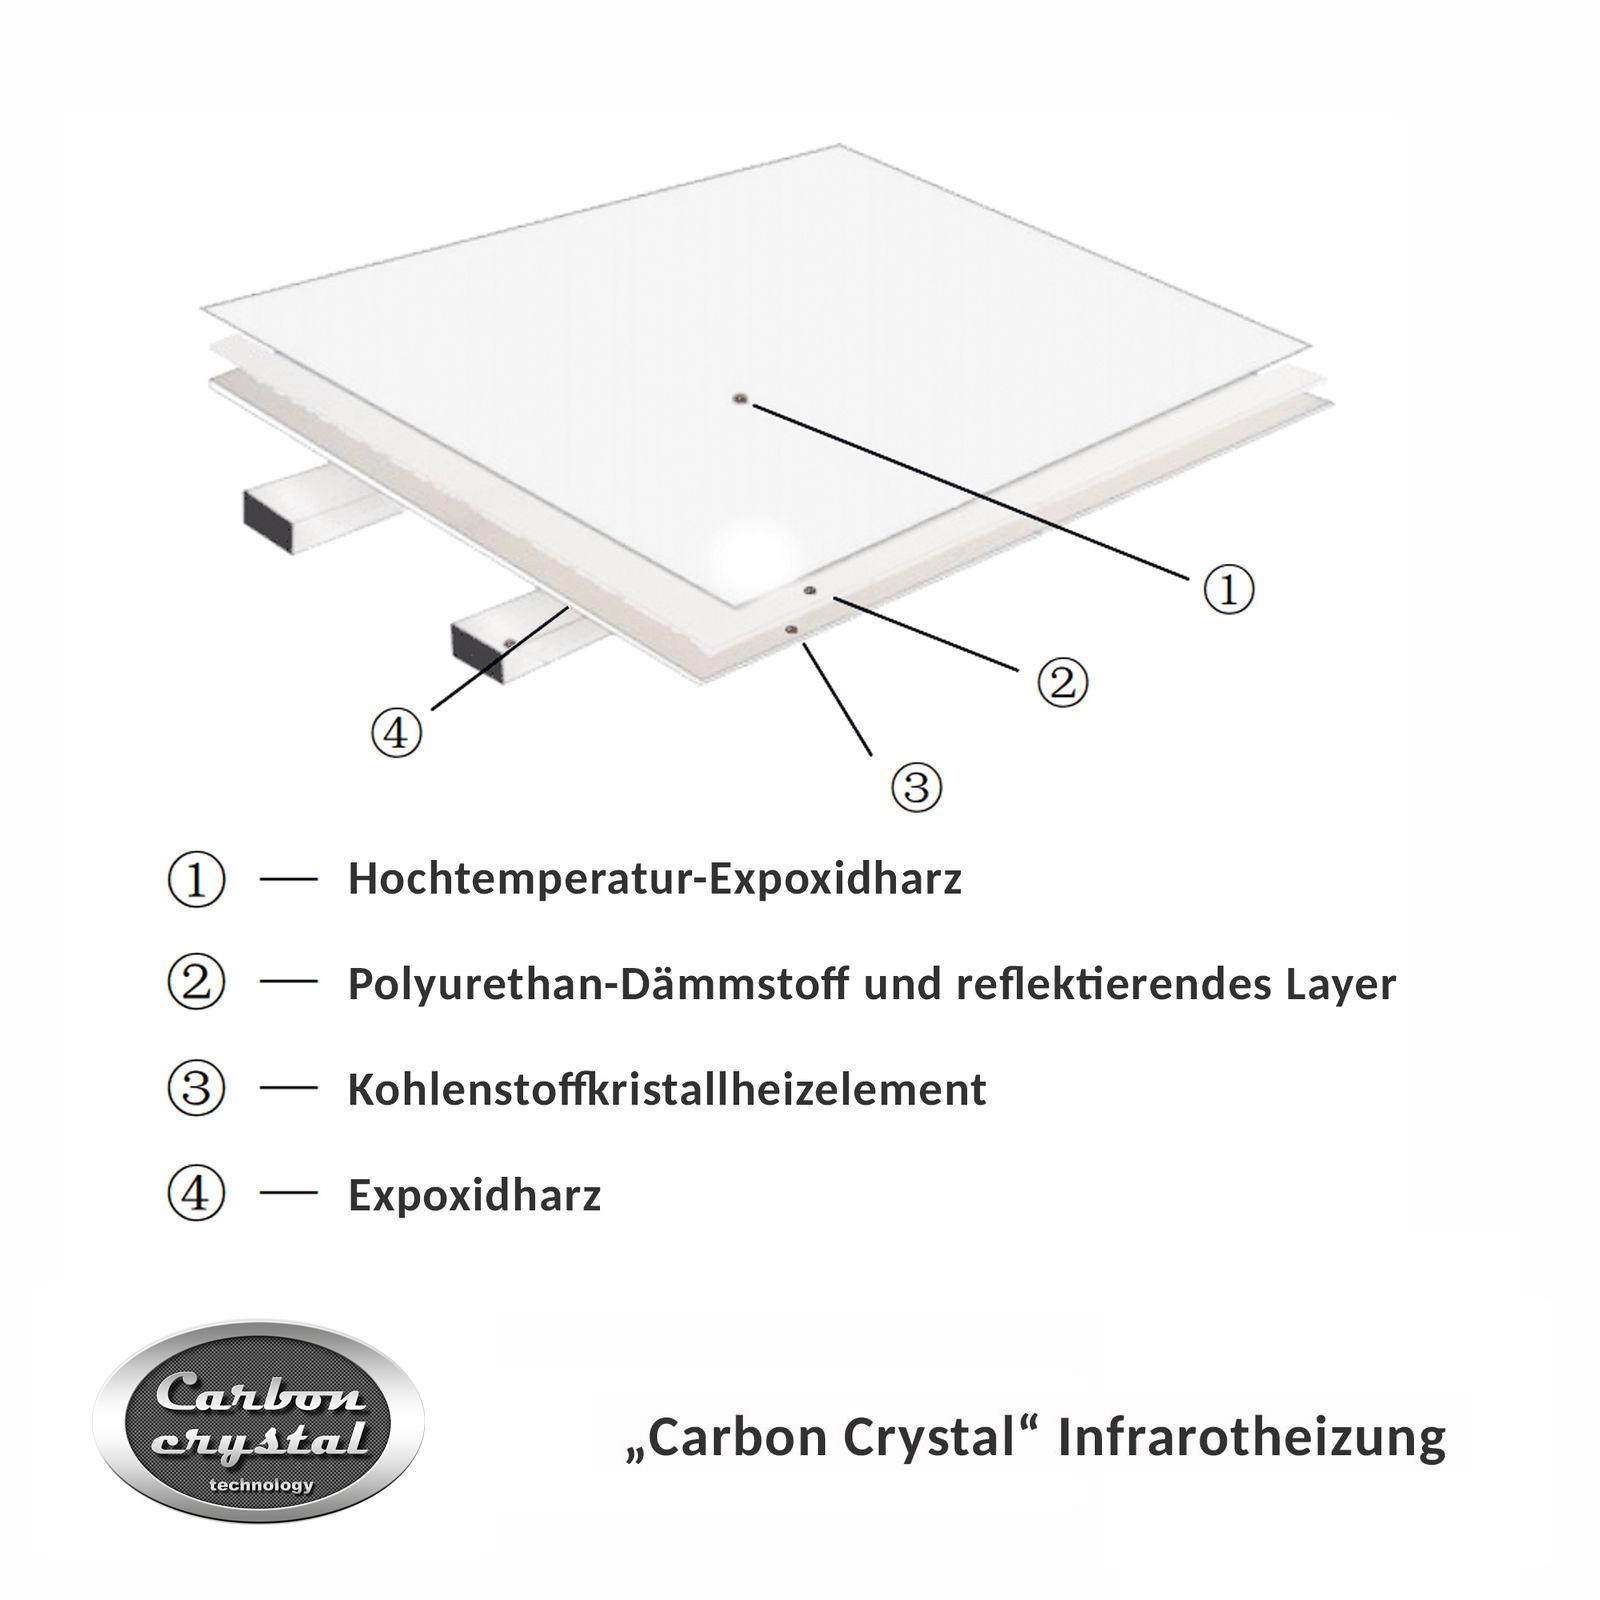 Viesta F450 Infrarotheizung Carbon Crystal (neueste Technologie) Heizpaneel Heizkörper Heizung heating panel ultraflache Wandheizung Weiß - 450 Watt